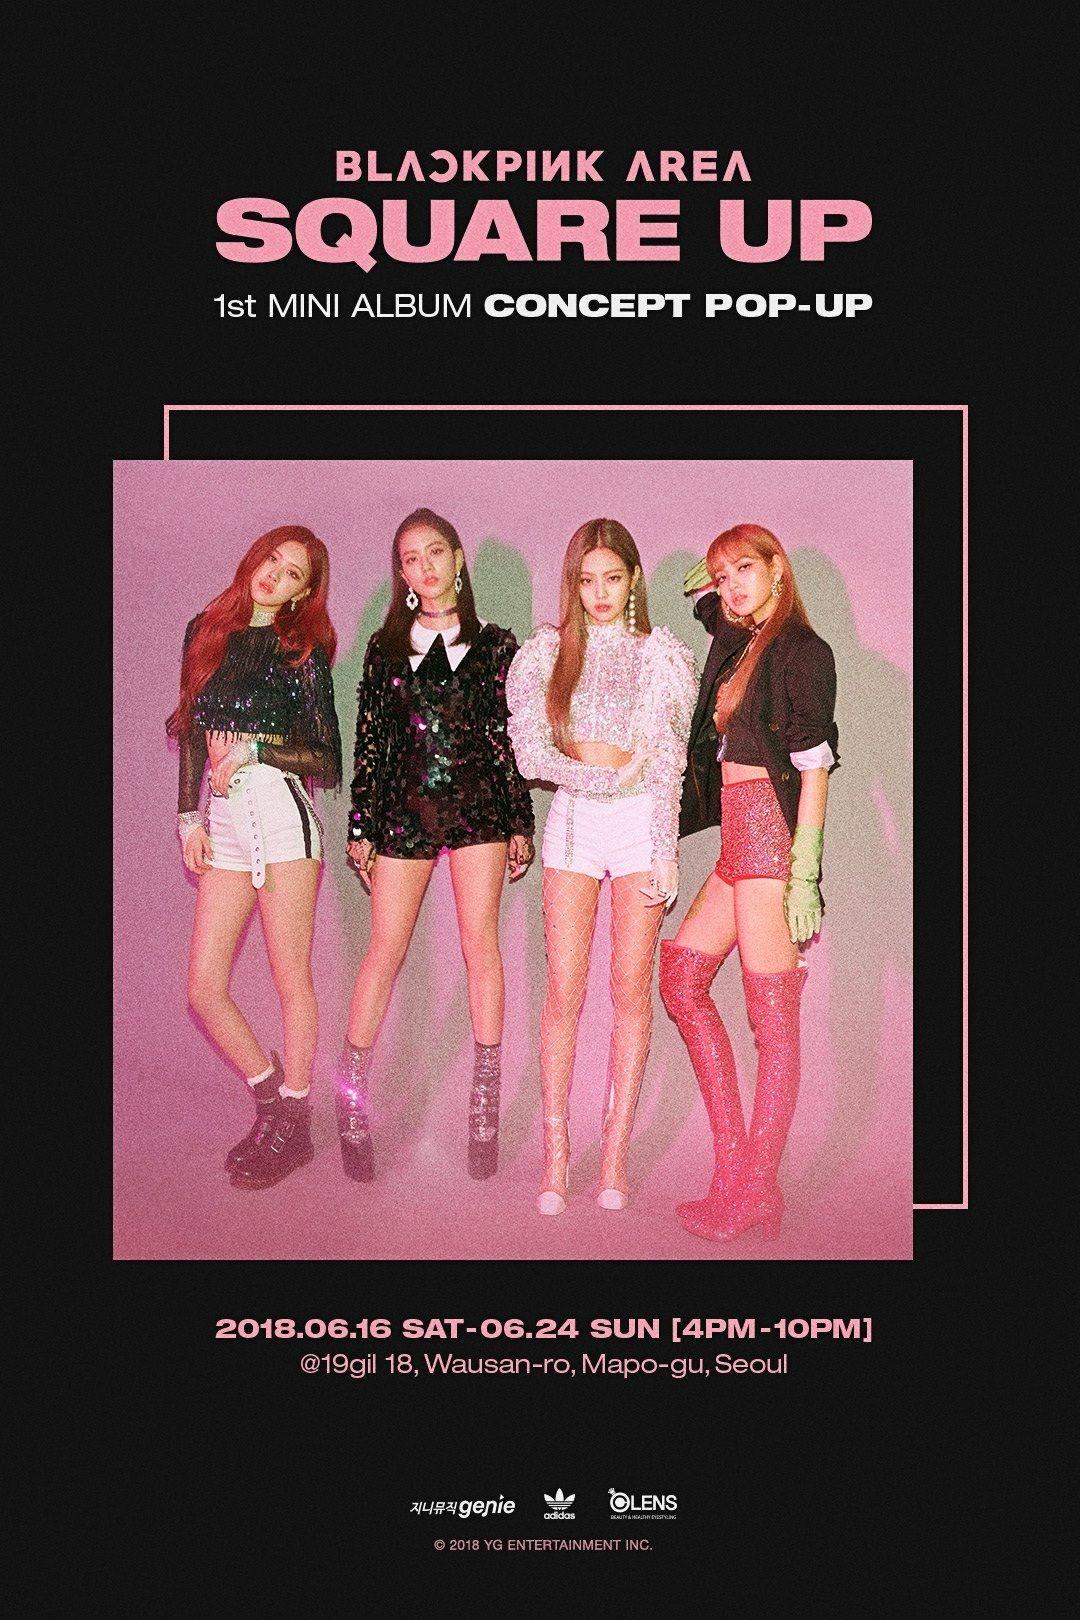 Blackpink Area Square Up 1st Mini Album Concept Pop Up Bllɔkpiik